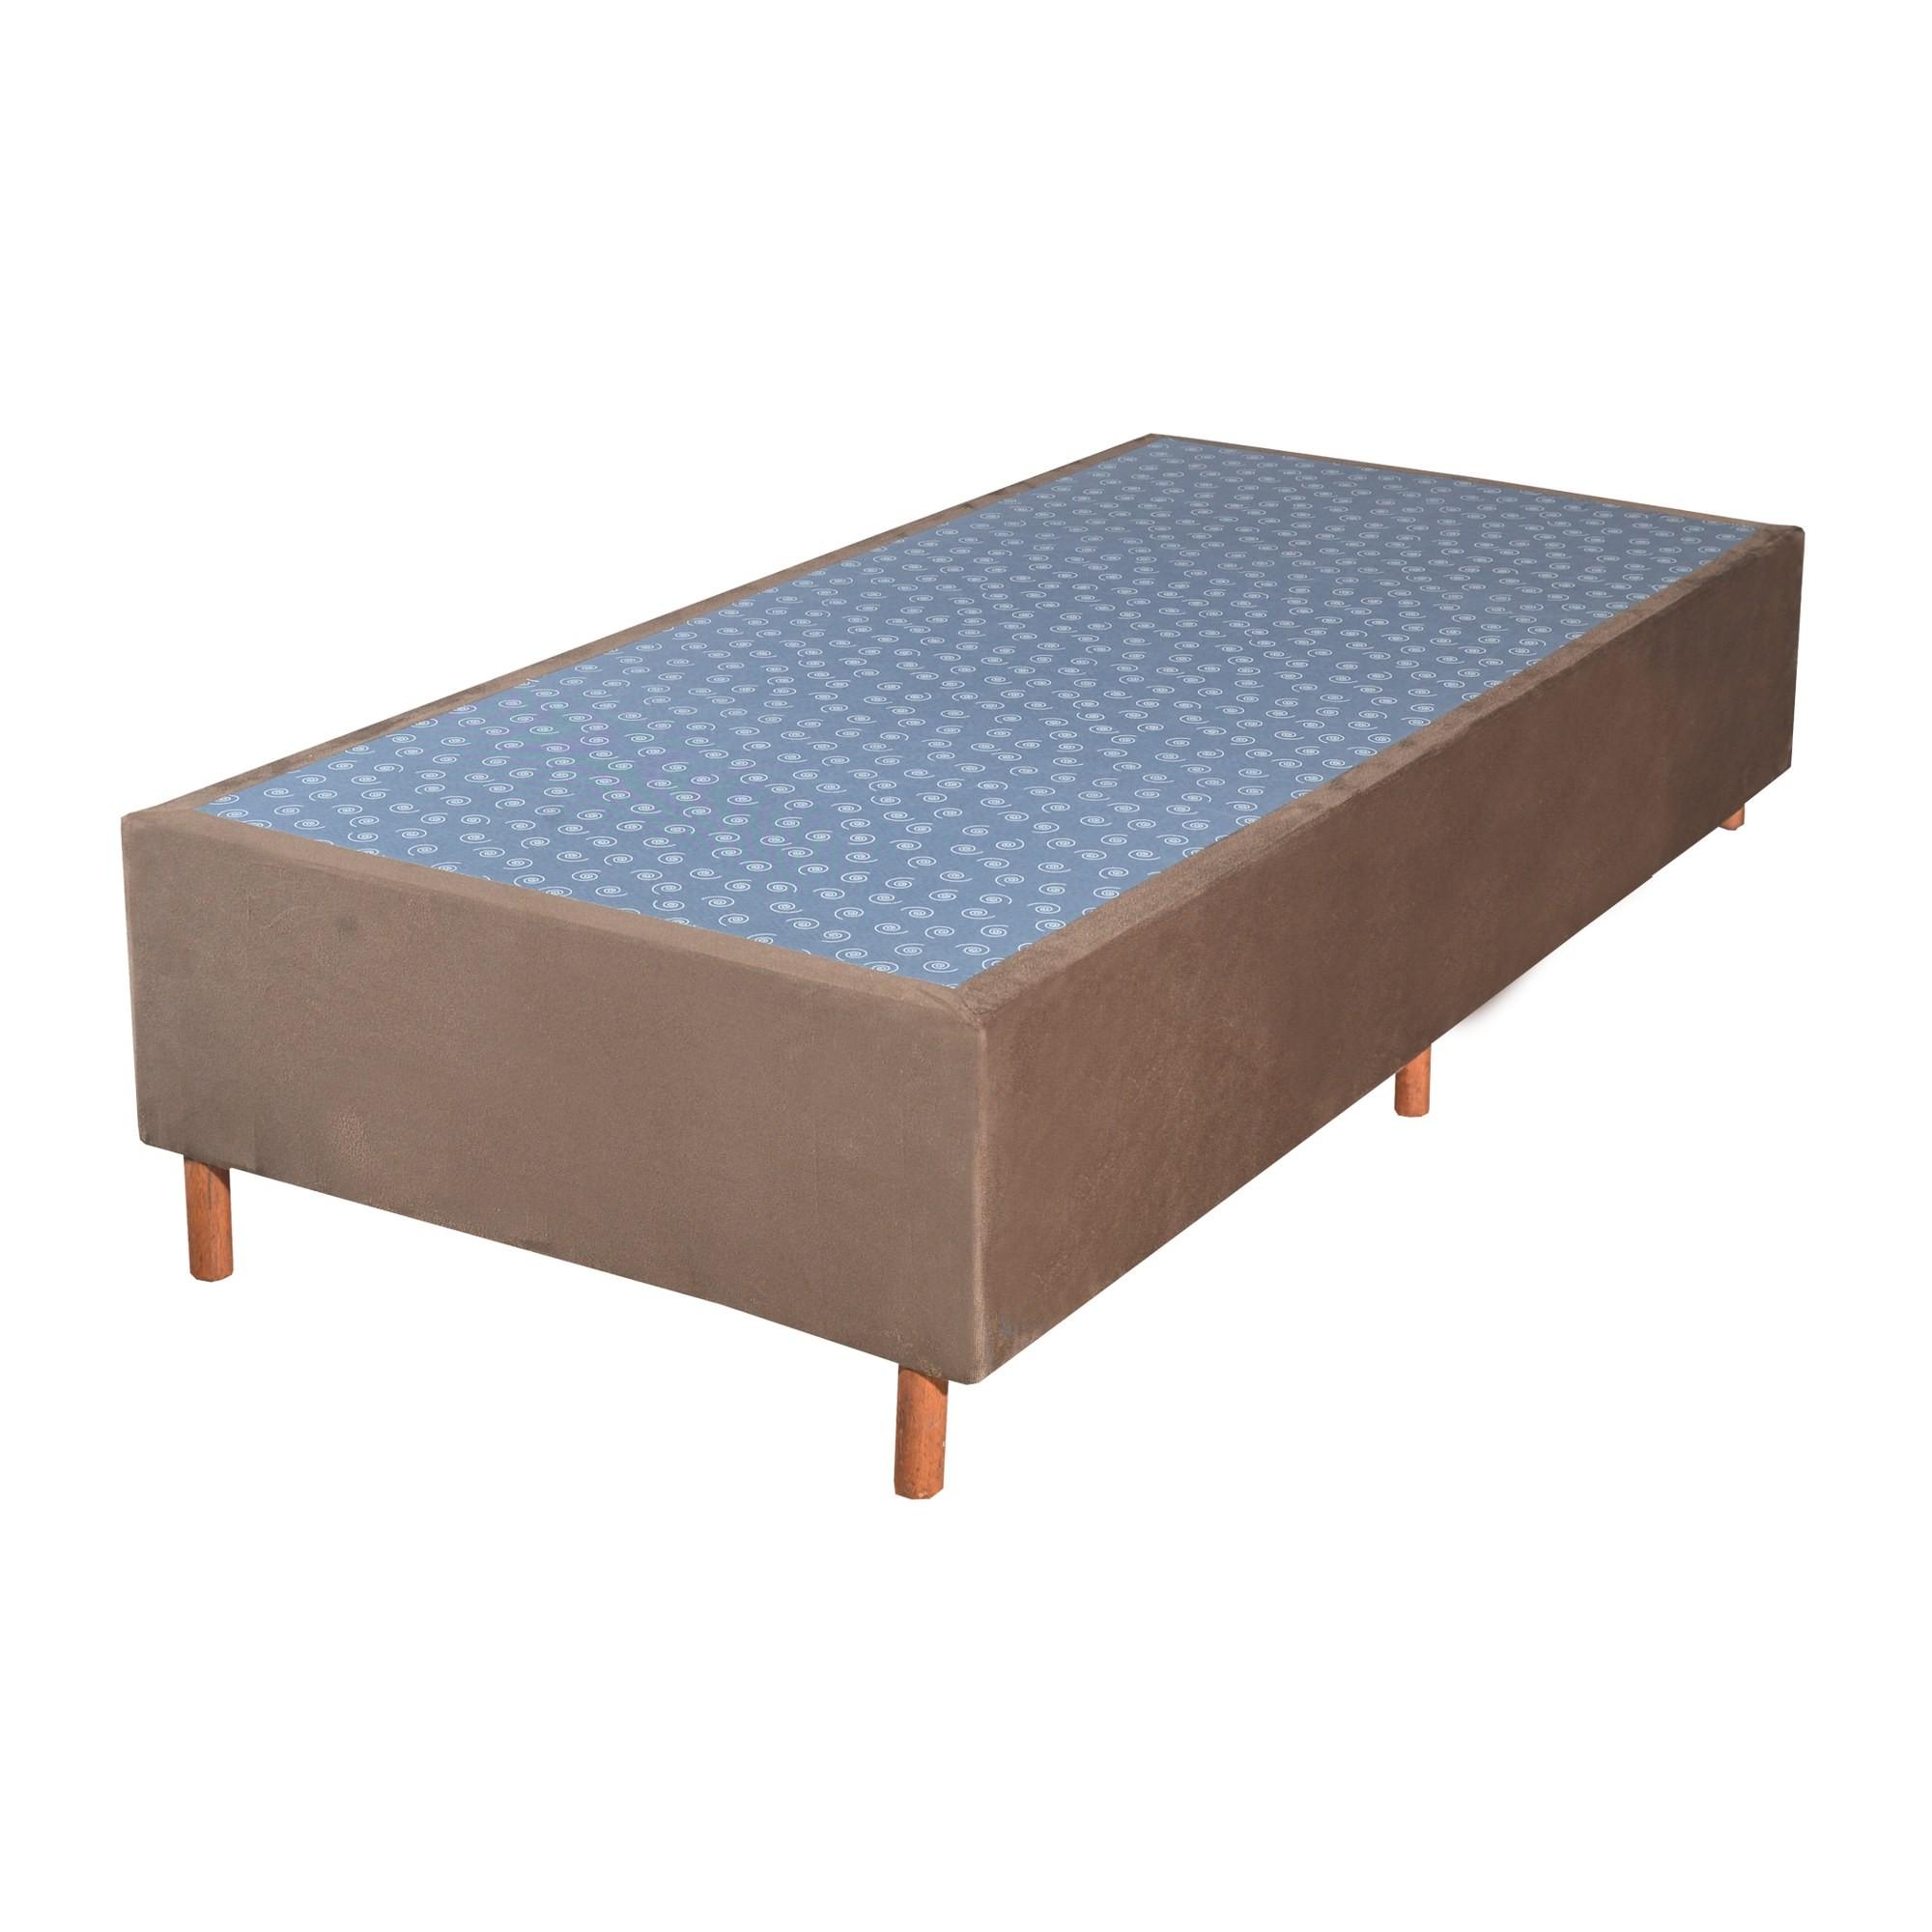 Cama Box Base Solteiro Veludo Marron 088x188x25